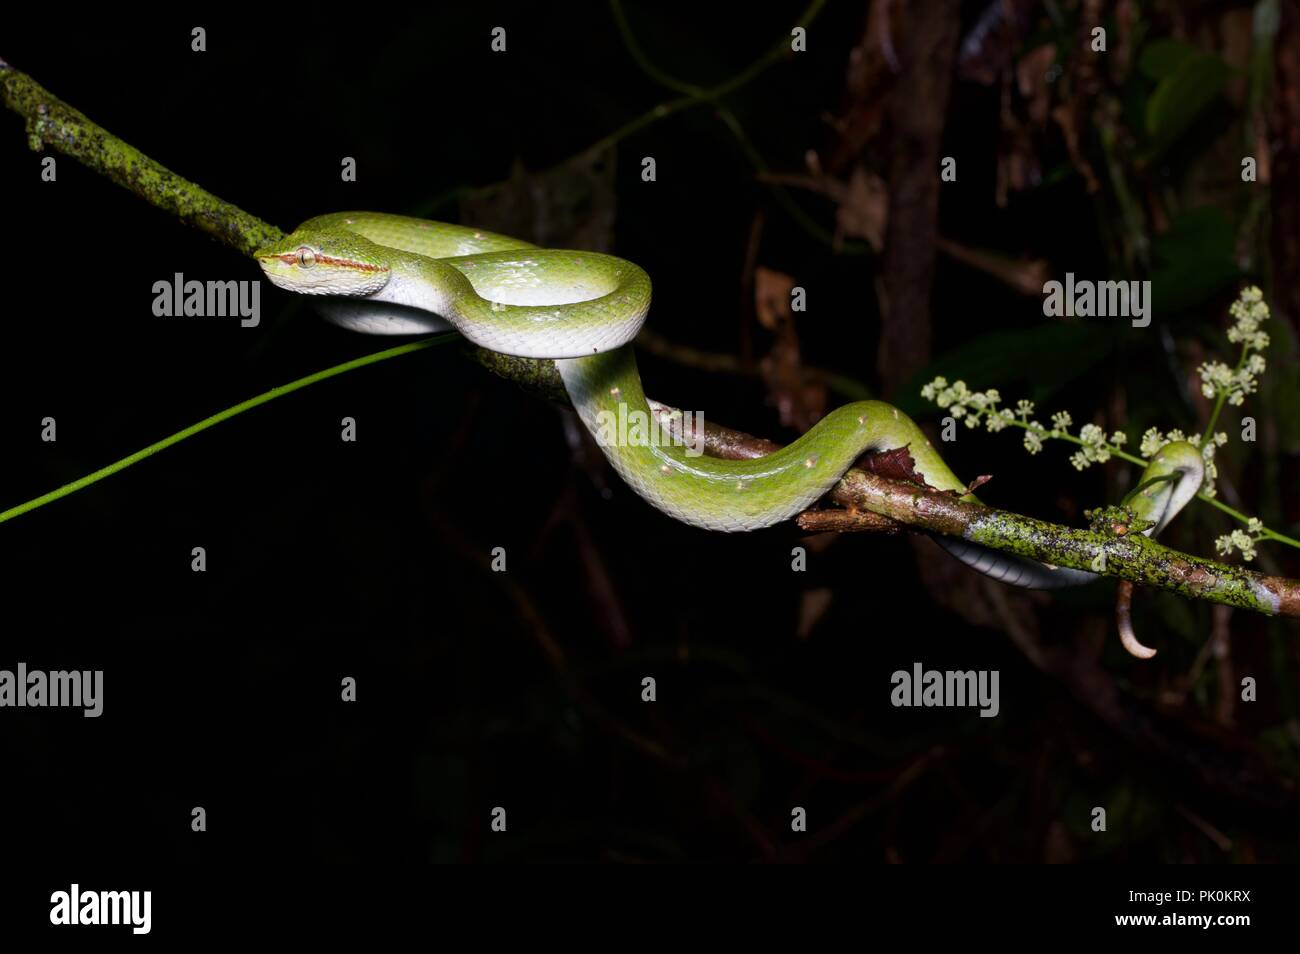 A Bornean Keeled Pit Viper (Tropidolaemus subannulatus) at night in Gunung Mulu National Park, Sarawak, East Malaysia, Borneo - Stock Image